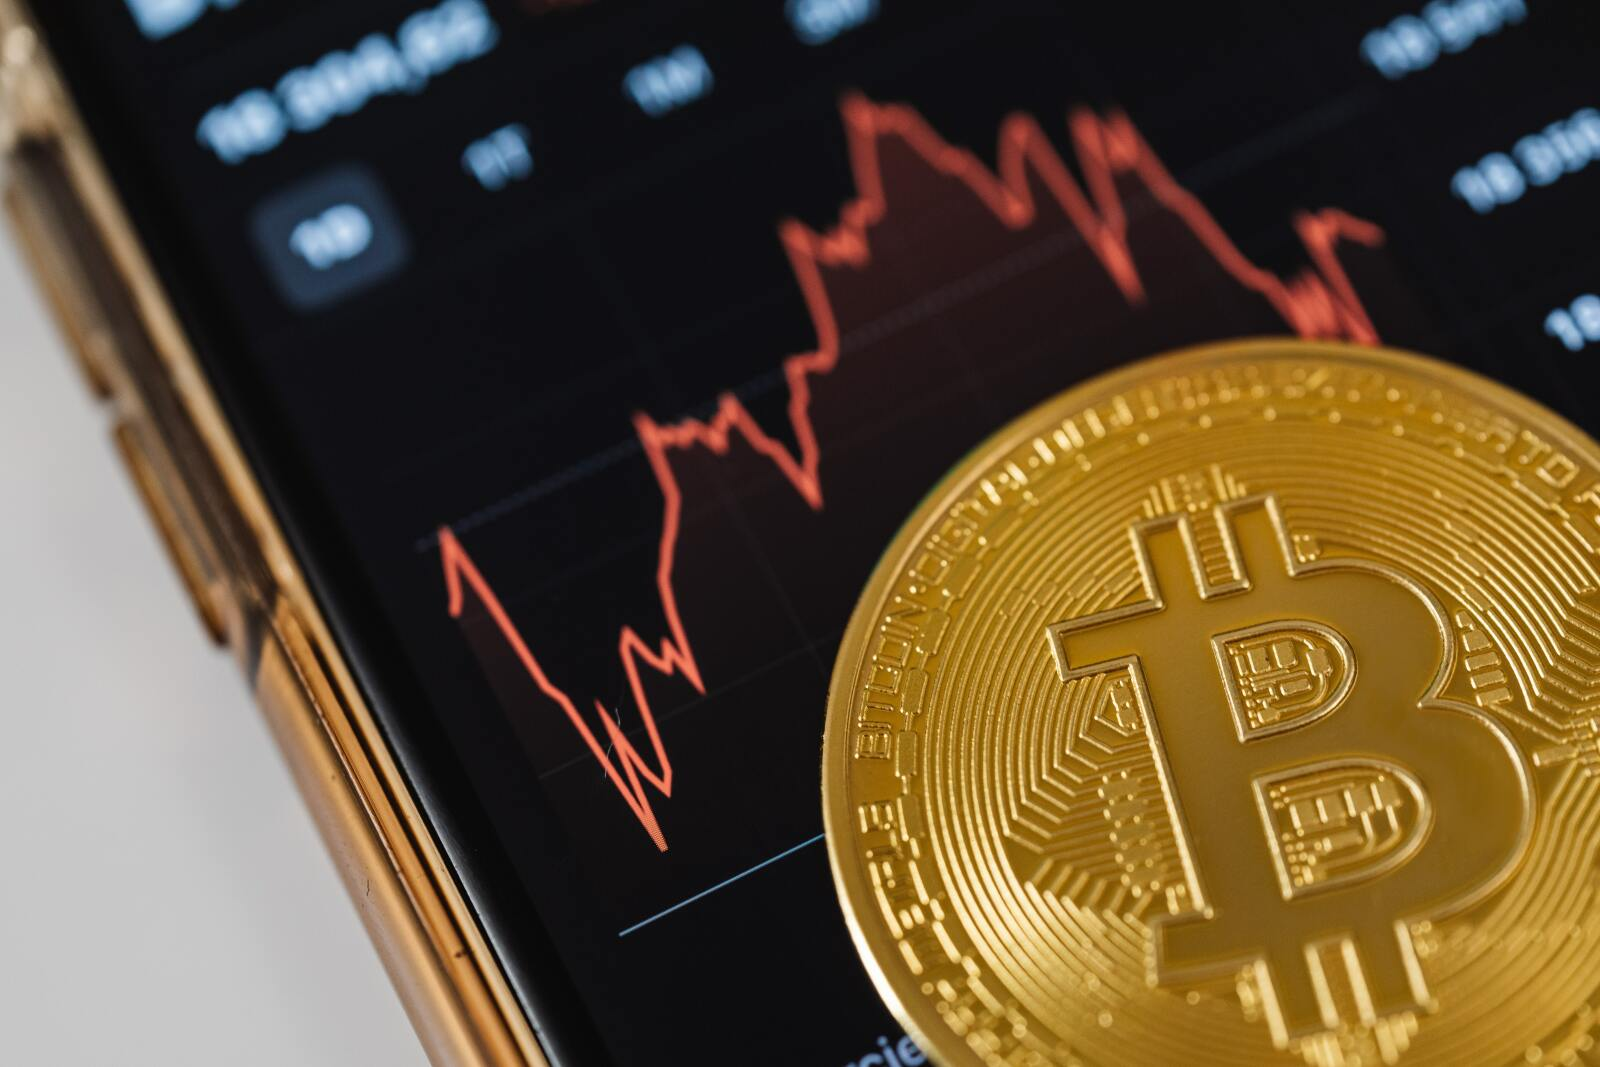 comdirect cfd demokonto verlängern bitcoin außenhandel